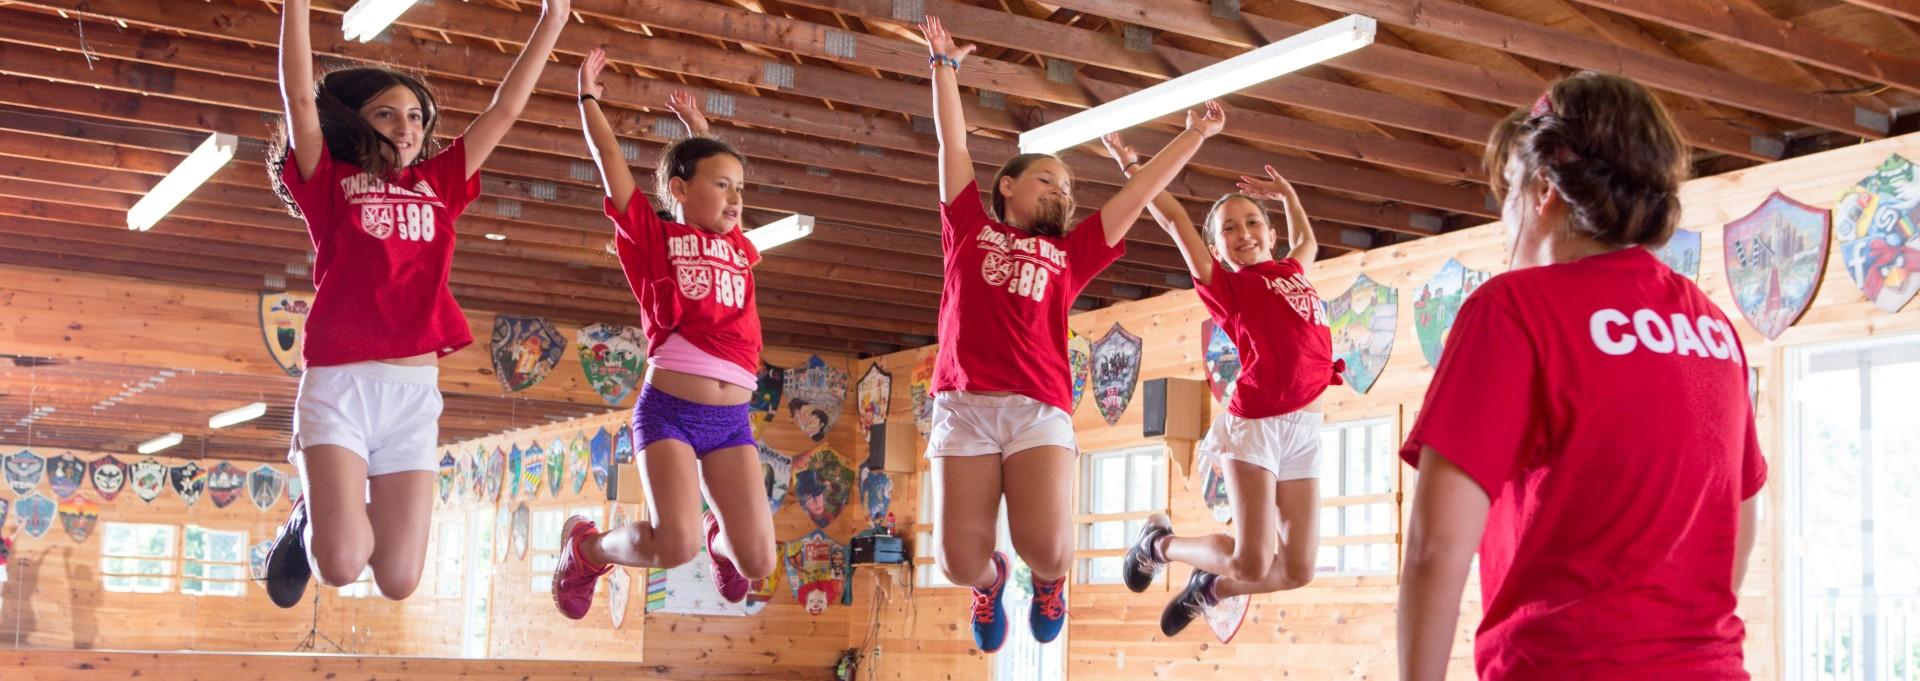 jumping-girls